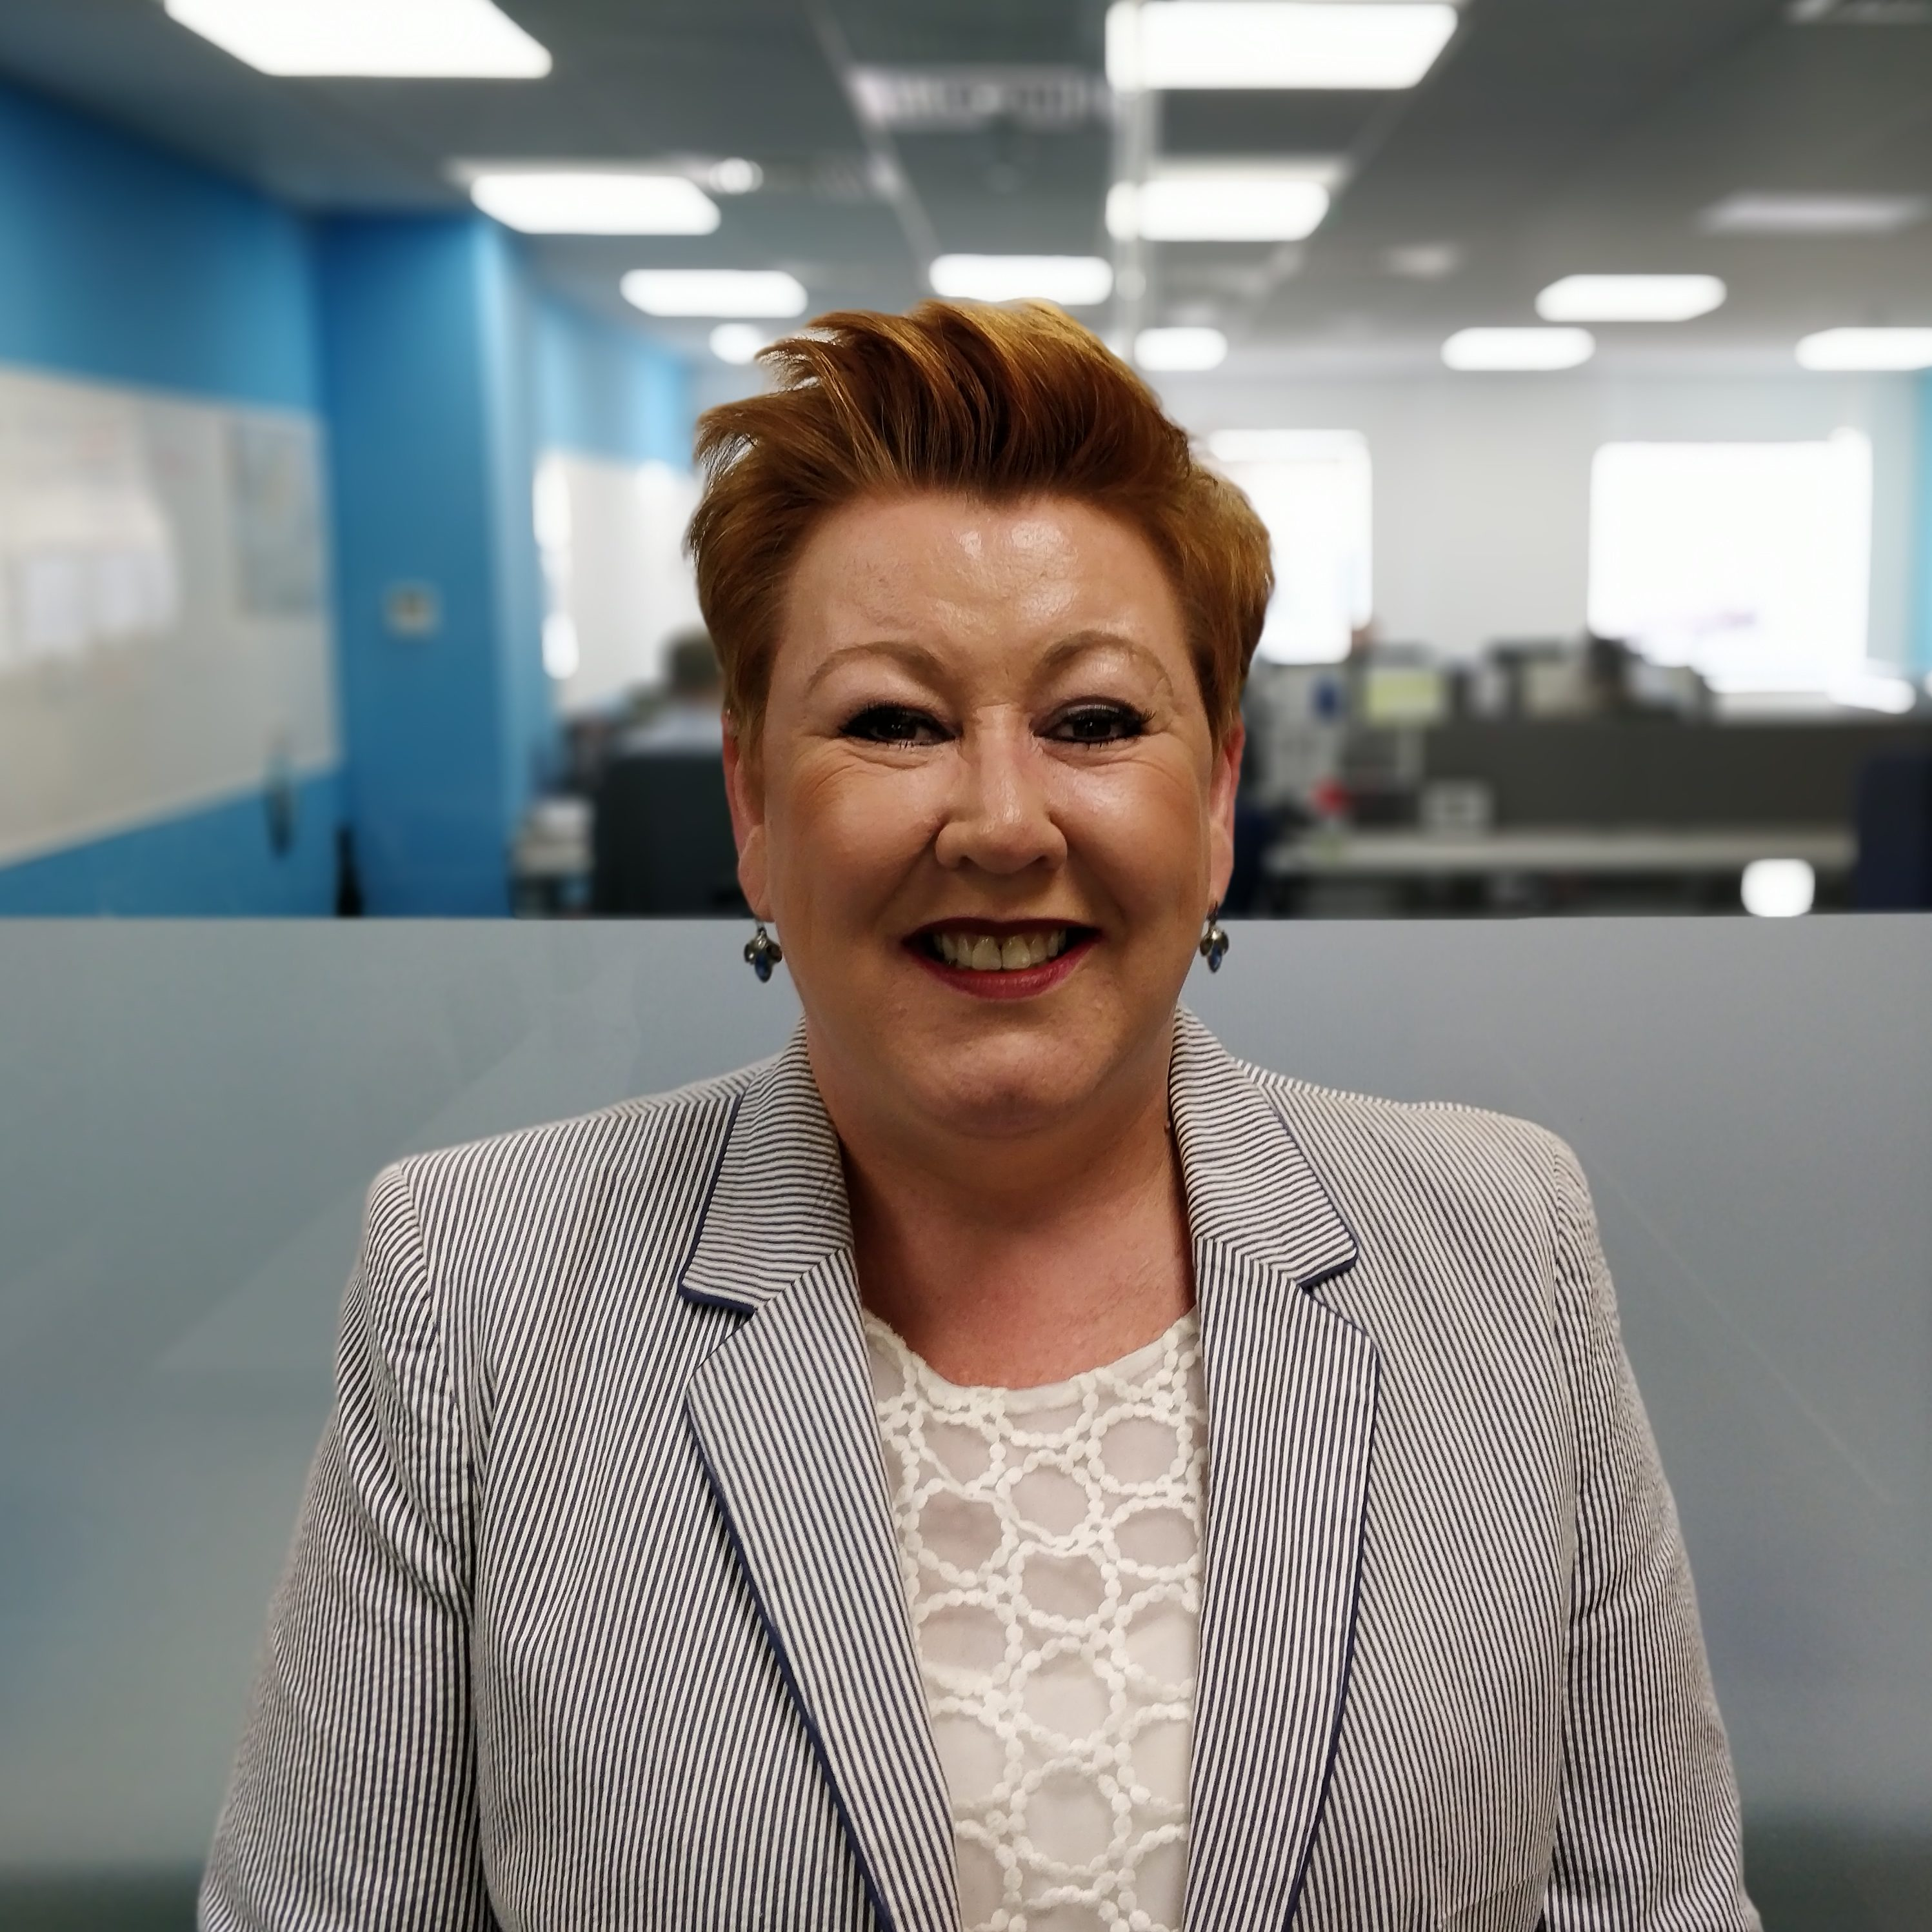 Lisa Donaldson - Recruitment Business Manager - Belfast, Northern Ireland